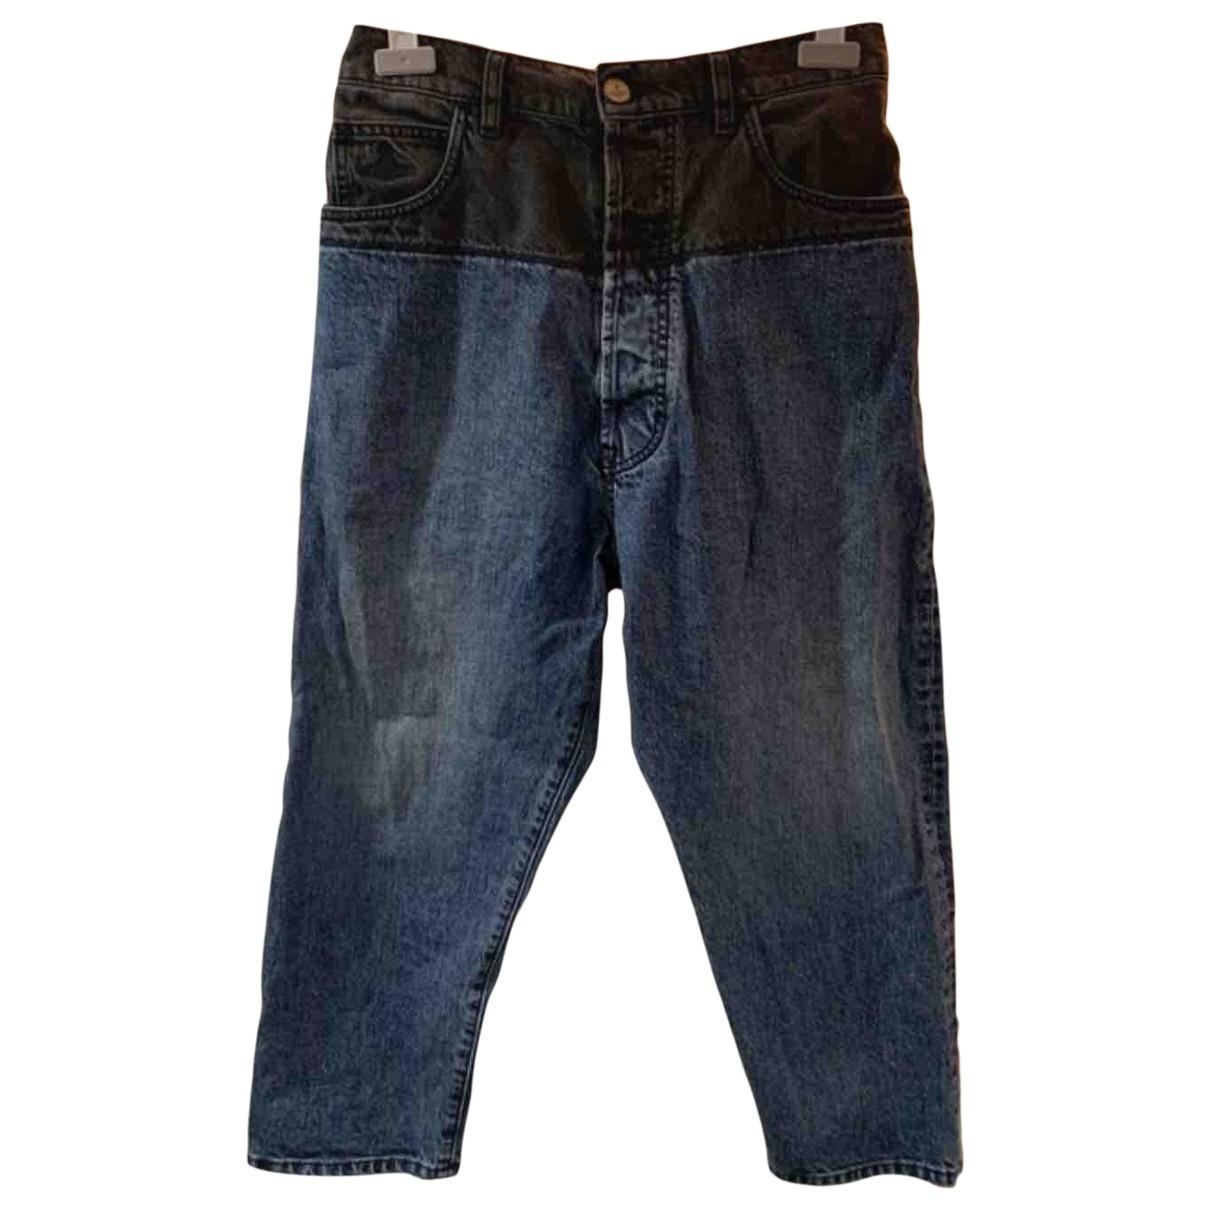 Vivienne Westwood Anglomania \N Blue Cotton Jeans for Men 30 US